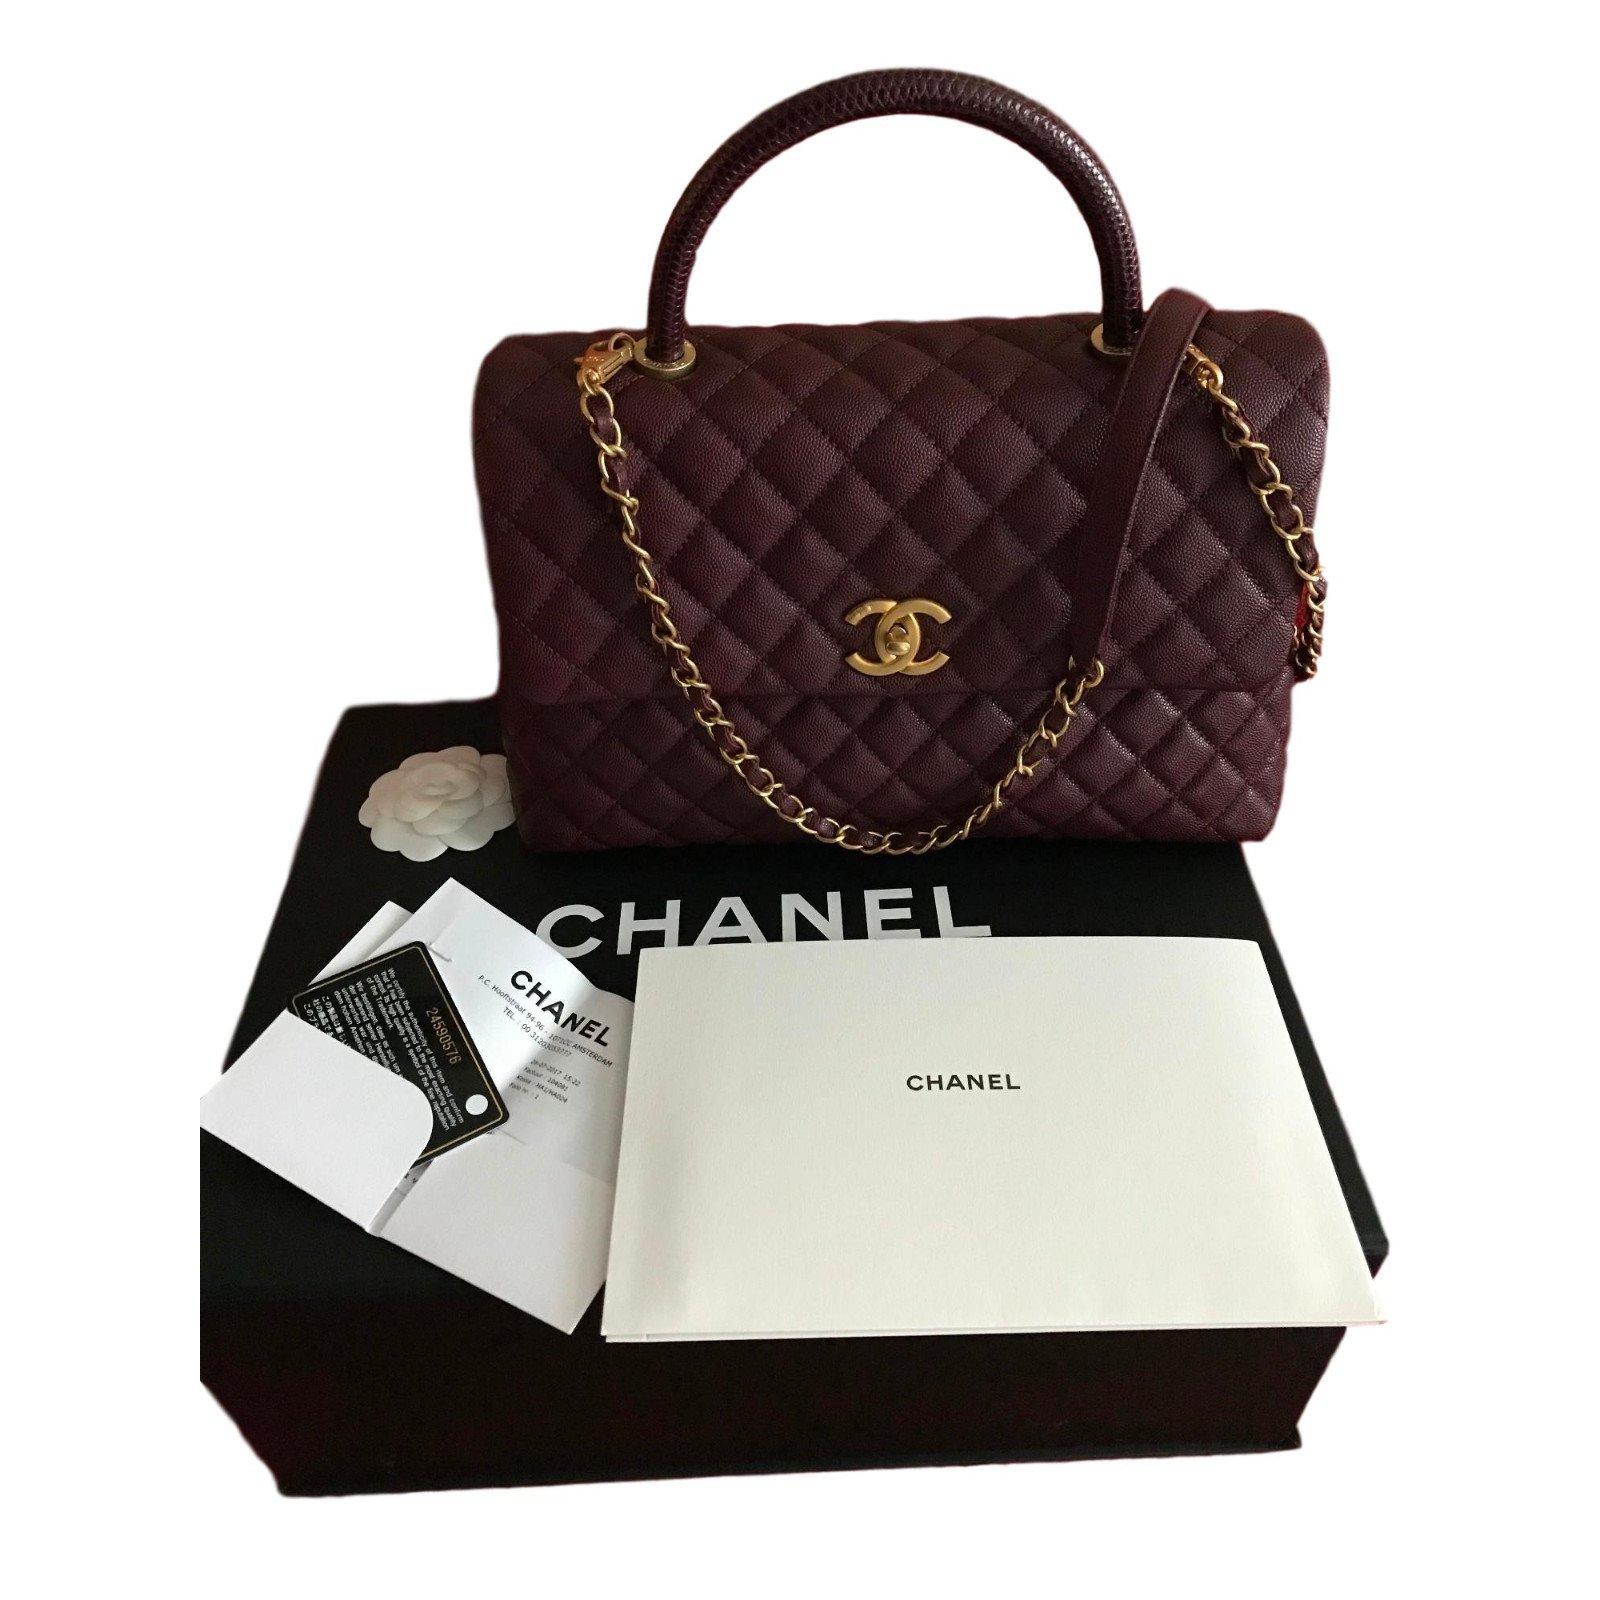 Chanel CHANEL Coco Handle Medium Bag Burgundy Caviar ...